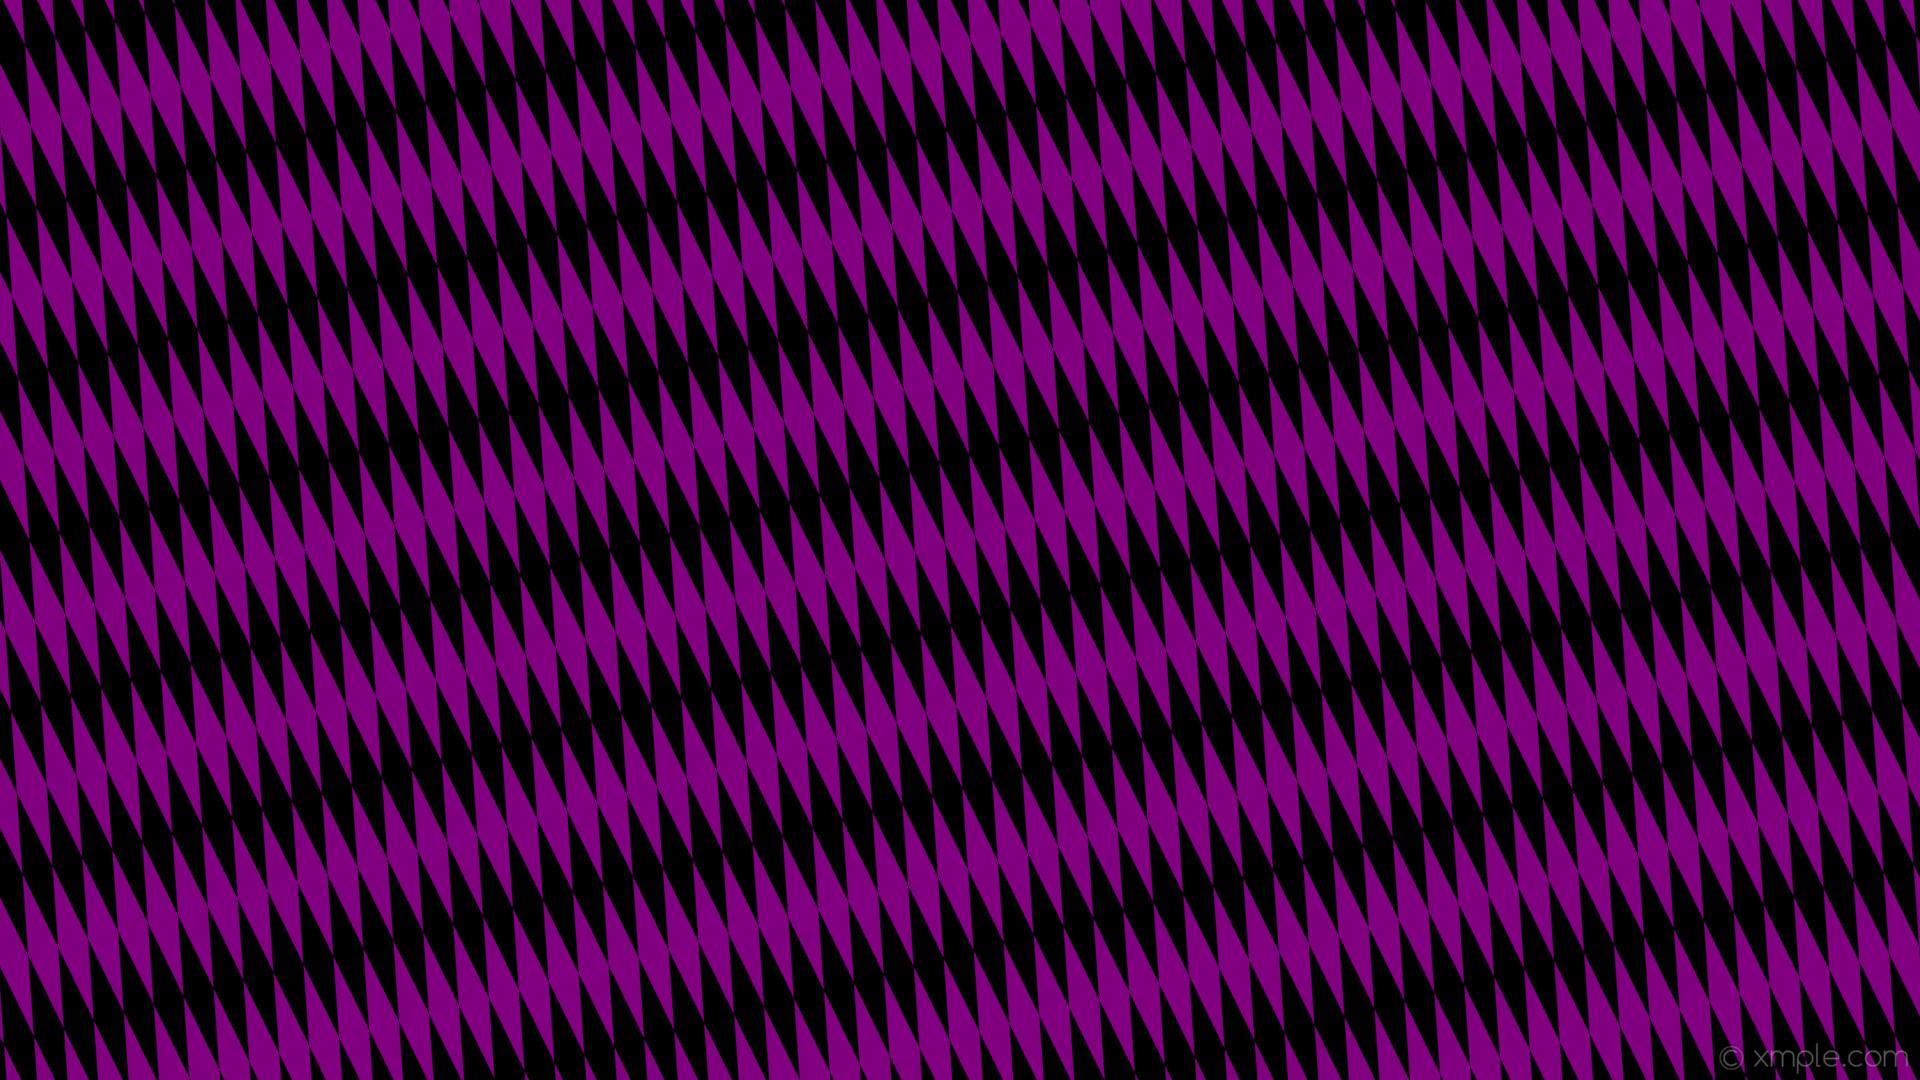 wallpaper lozenge purple rhombus diamond black #800080 #000000 105° 160px  31px